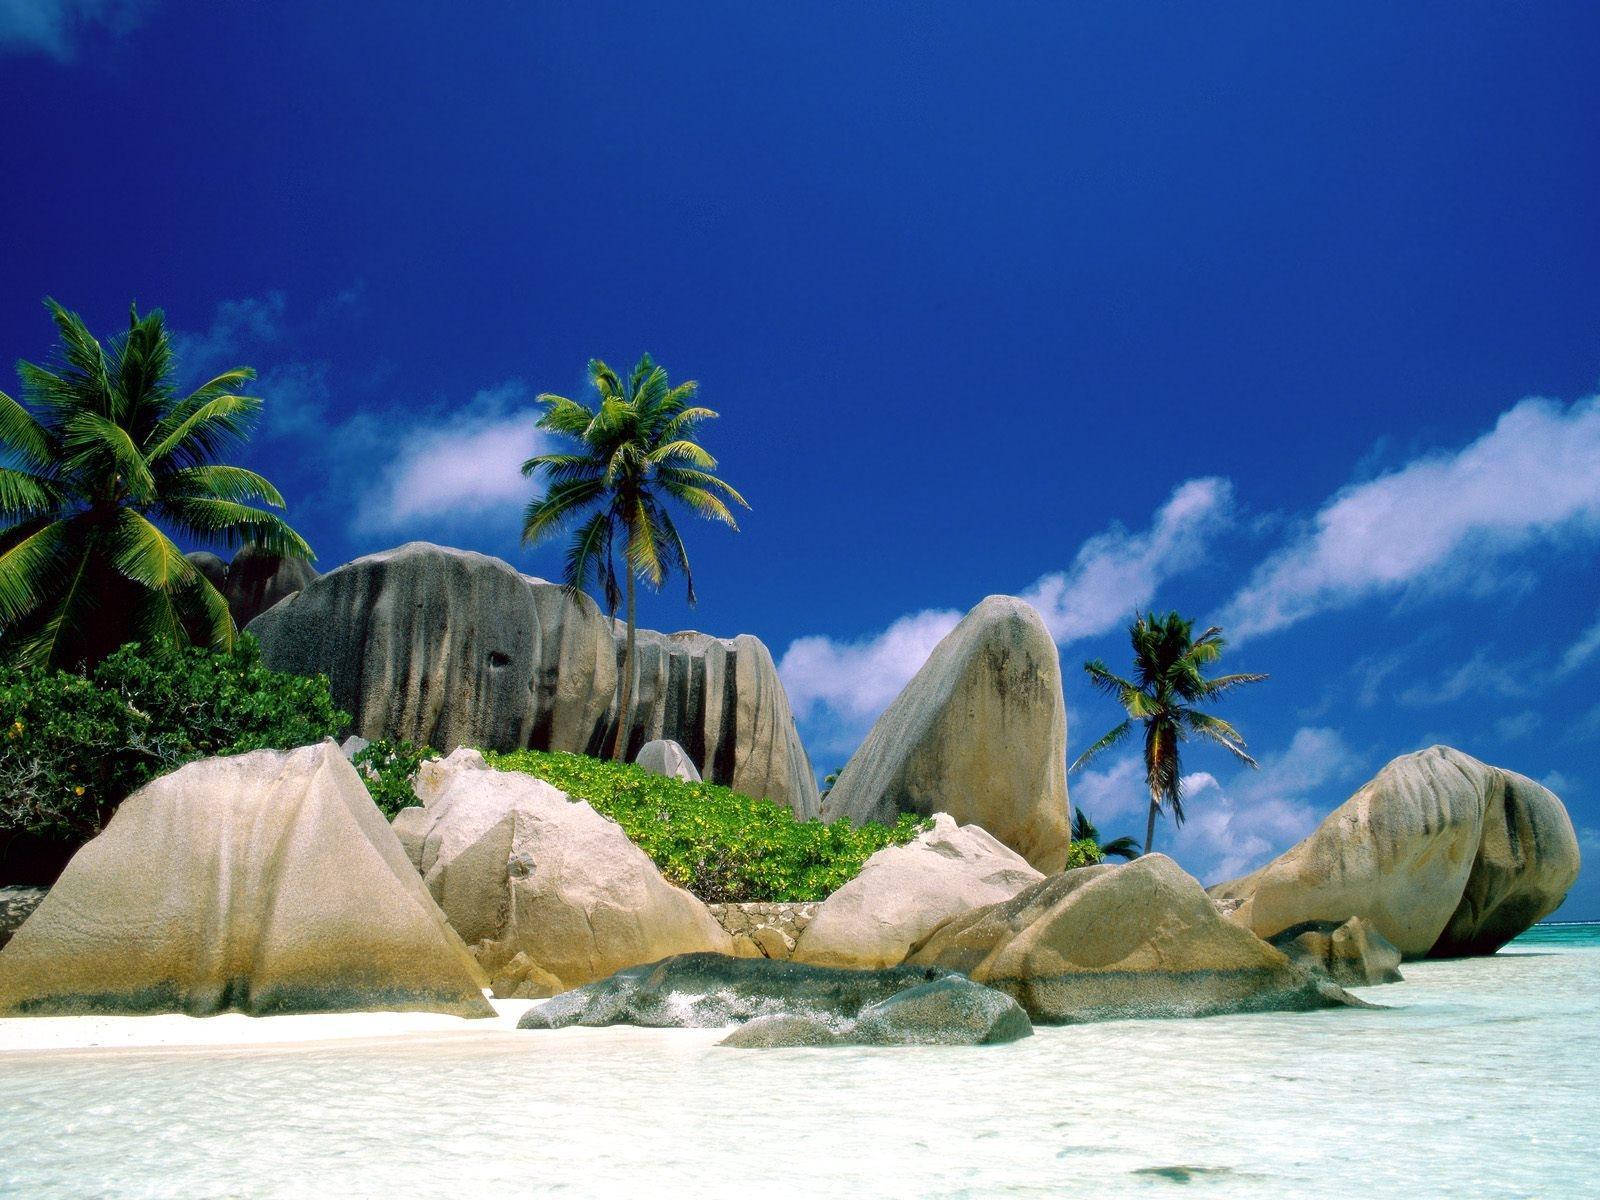 Beautiful Giant Stone Beach - Beautiful Giant Stone Beach